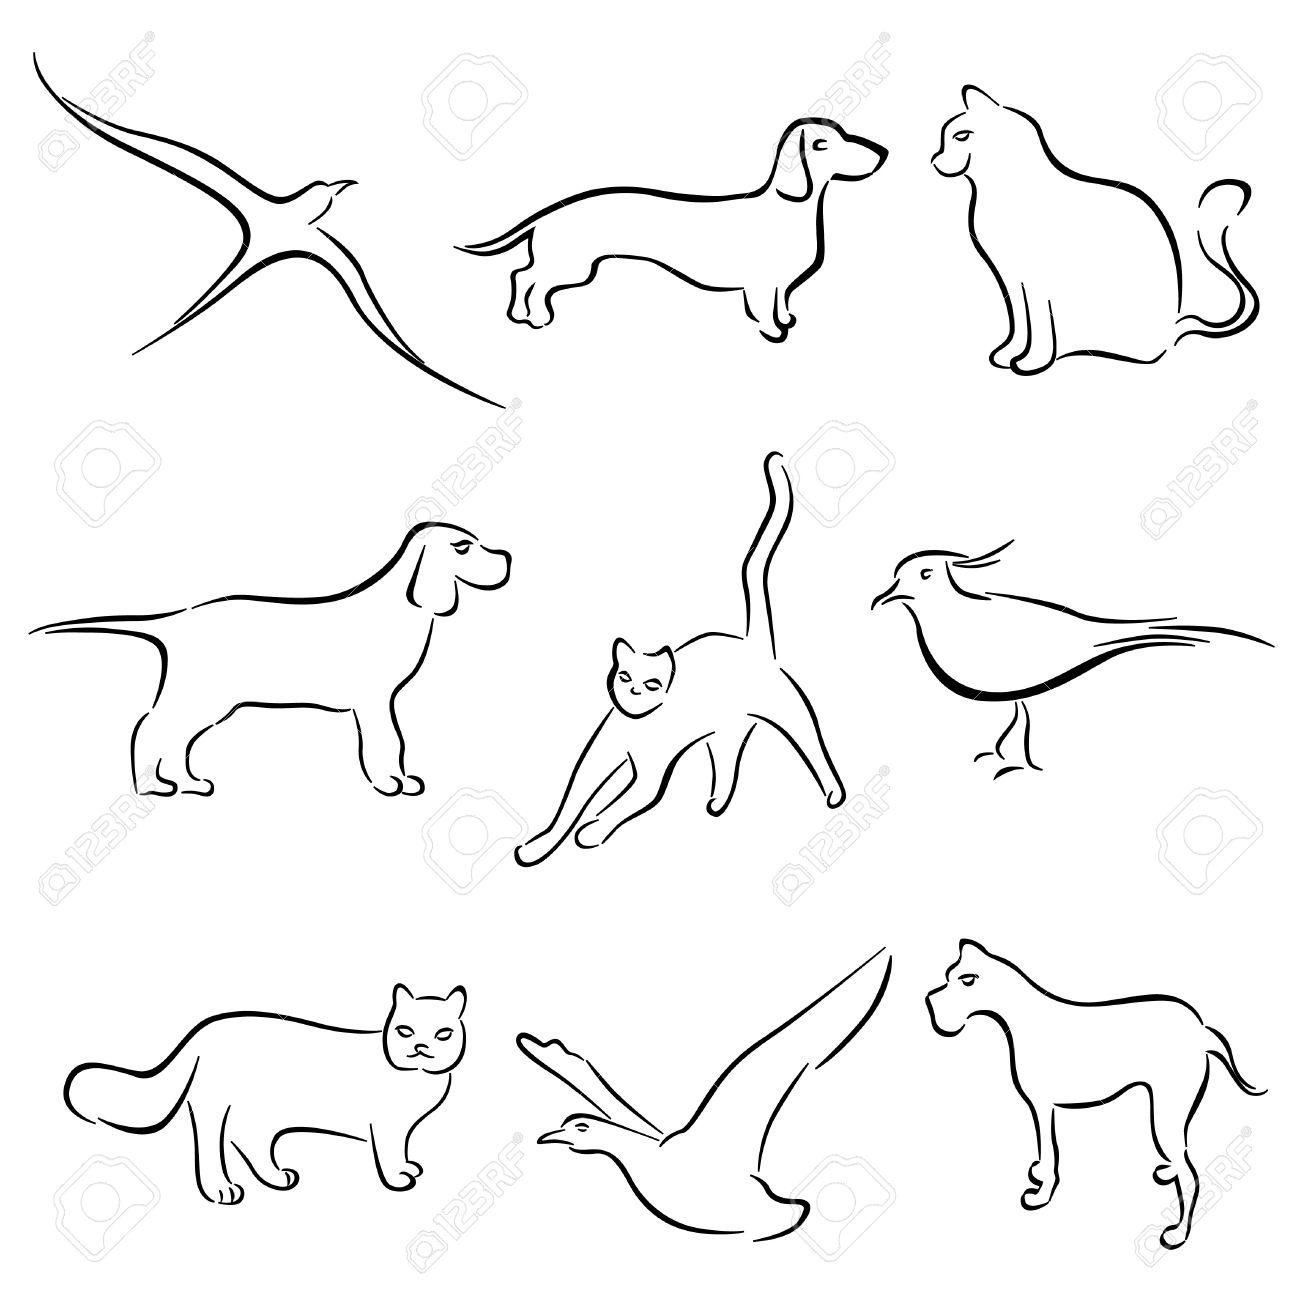 1300x1300 Dog, Cat, Rabbit Animal Drawing Vector Royalty Free Cliparts